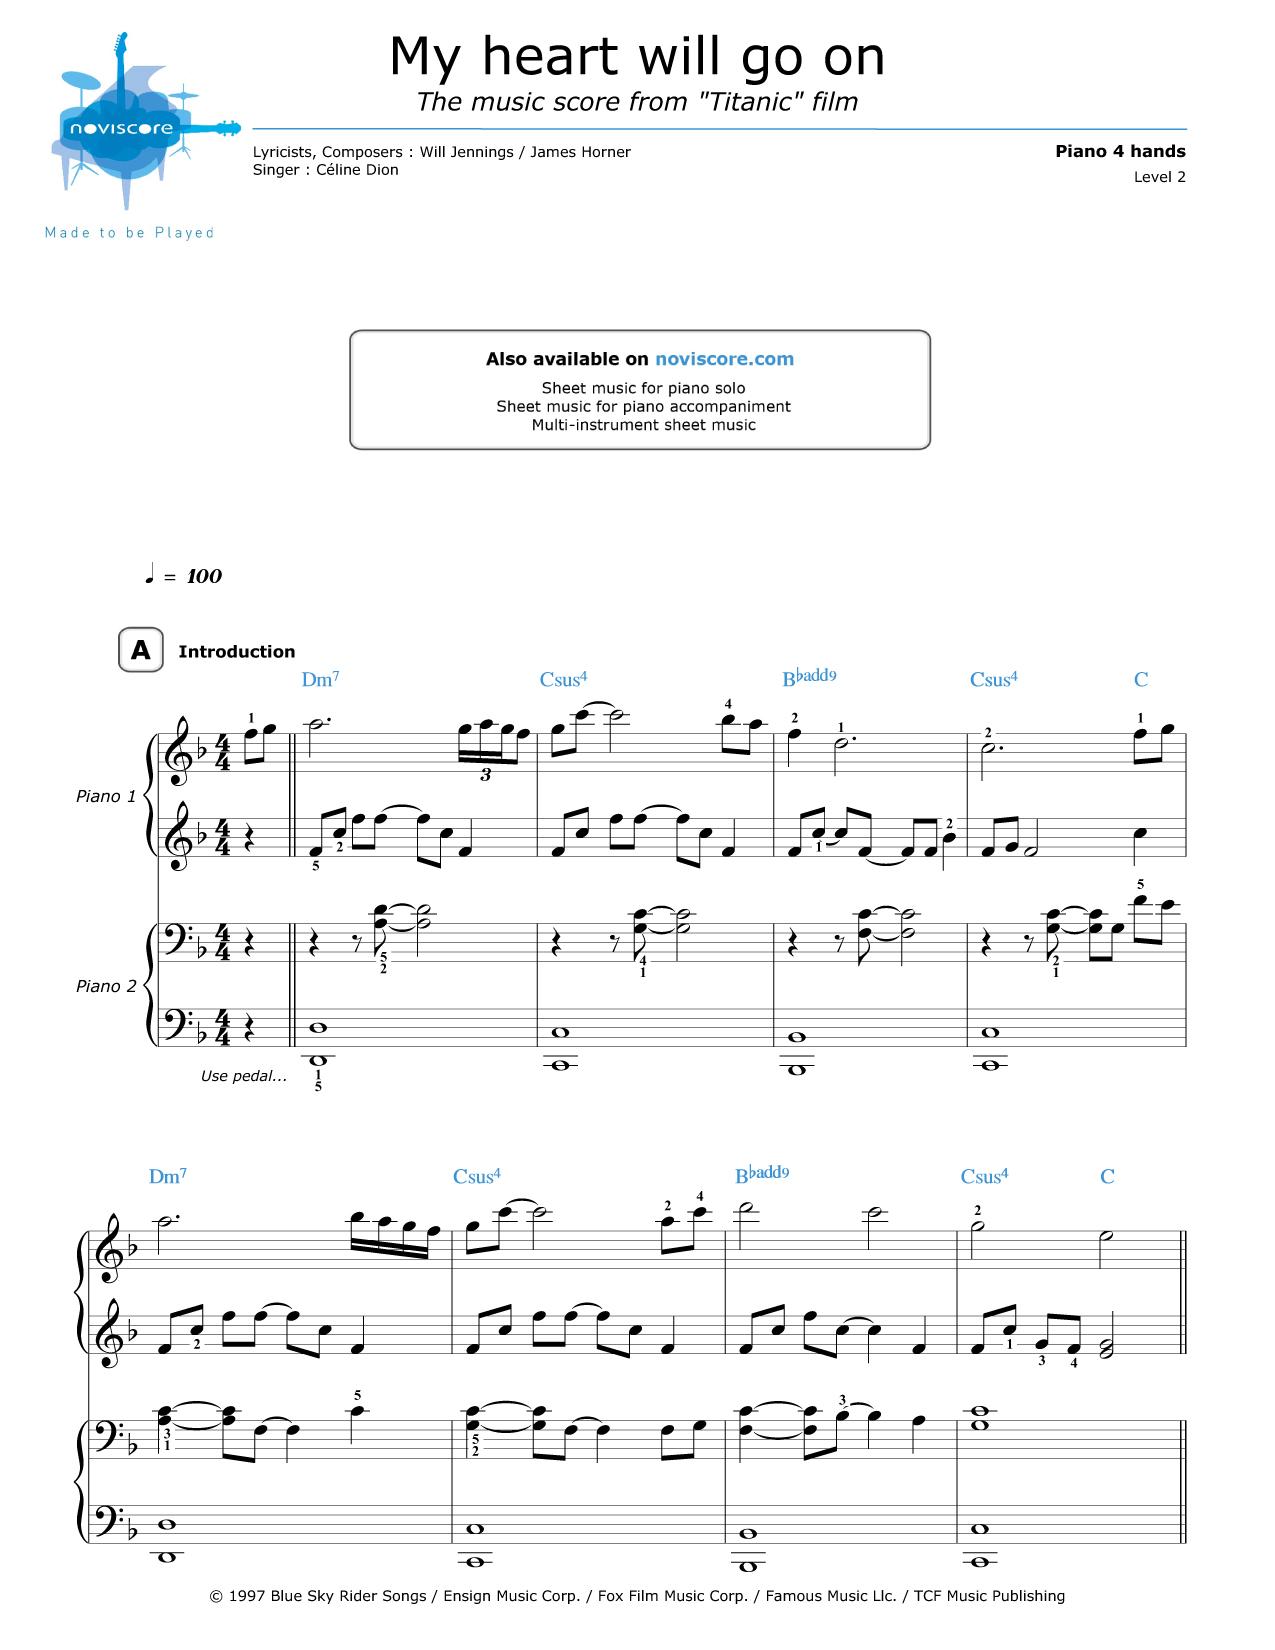 All Music Chords my heart will go on sheet music : Piano 4 hands My Heart Will Go On (Céline Dion) | Partitions Noviscore